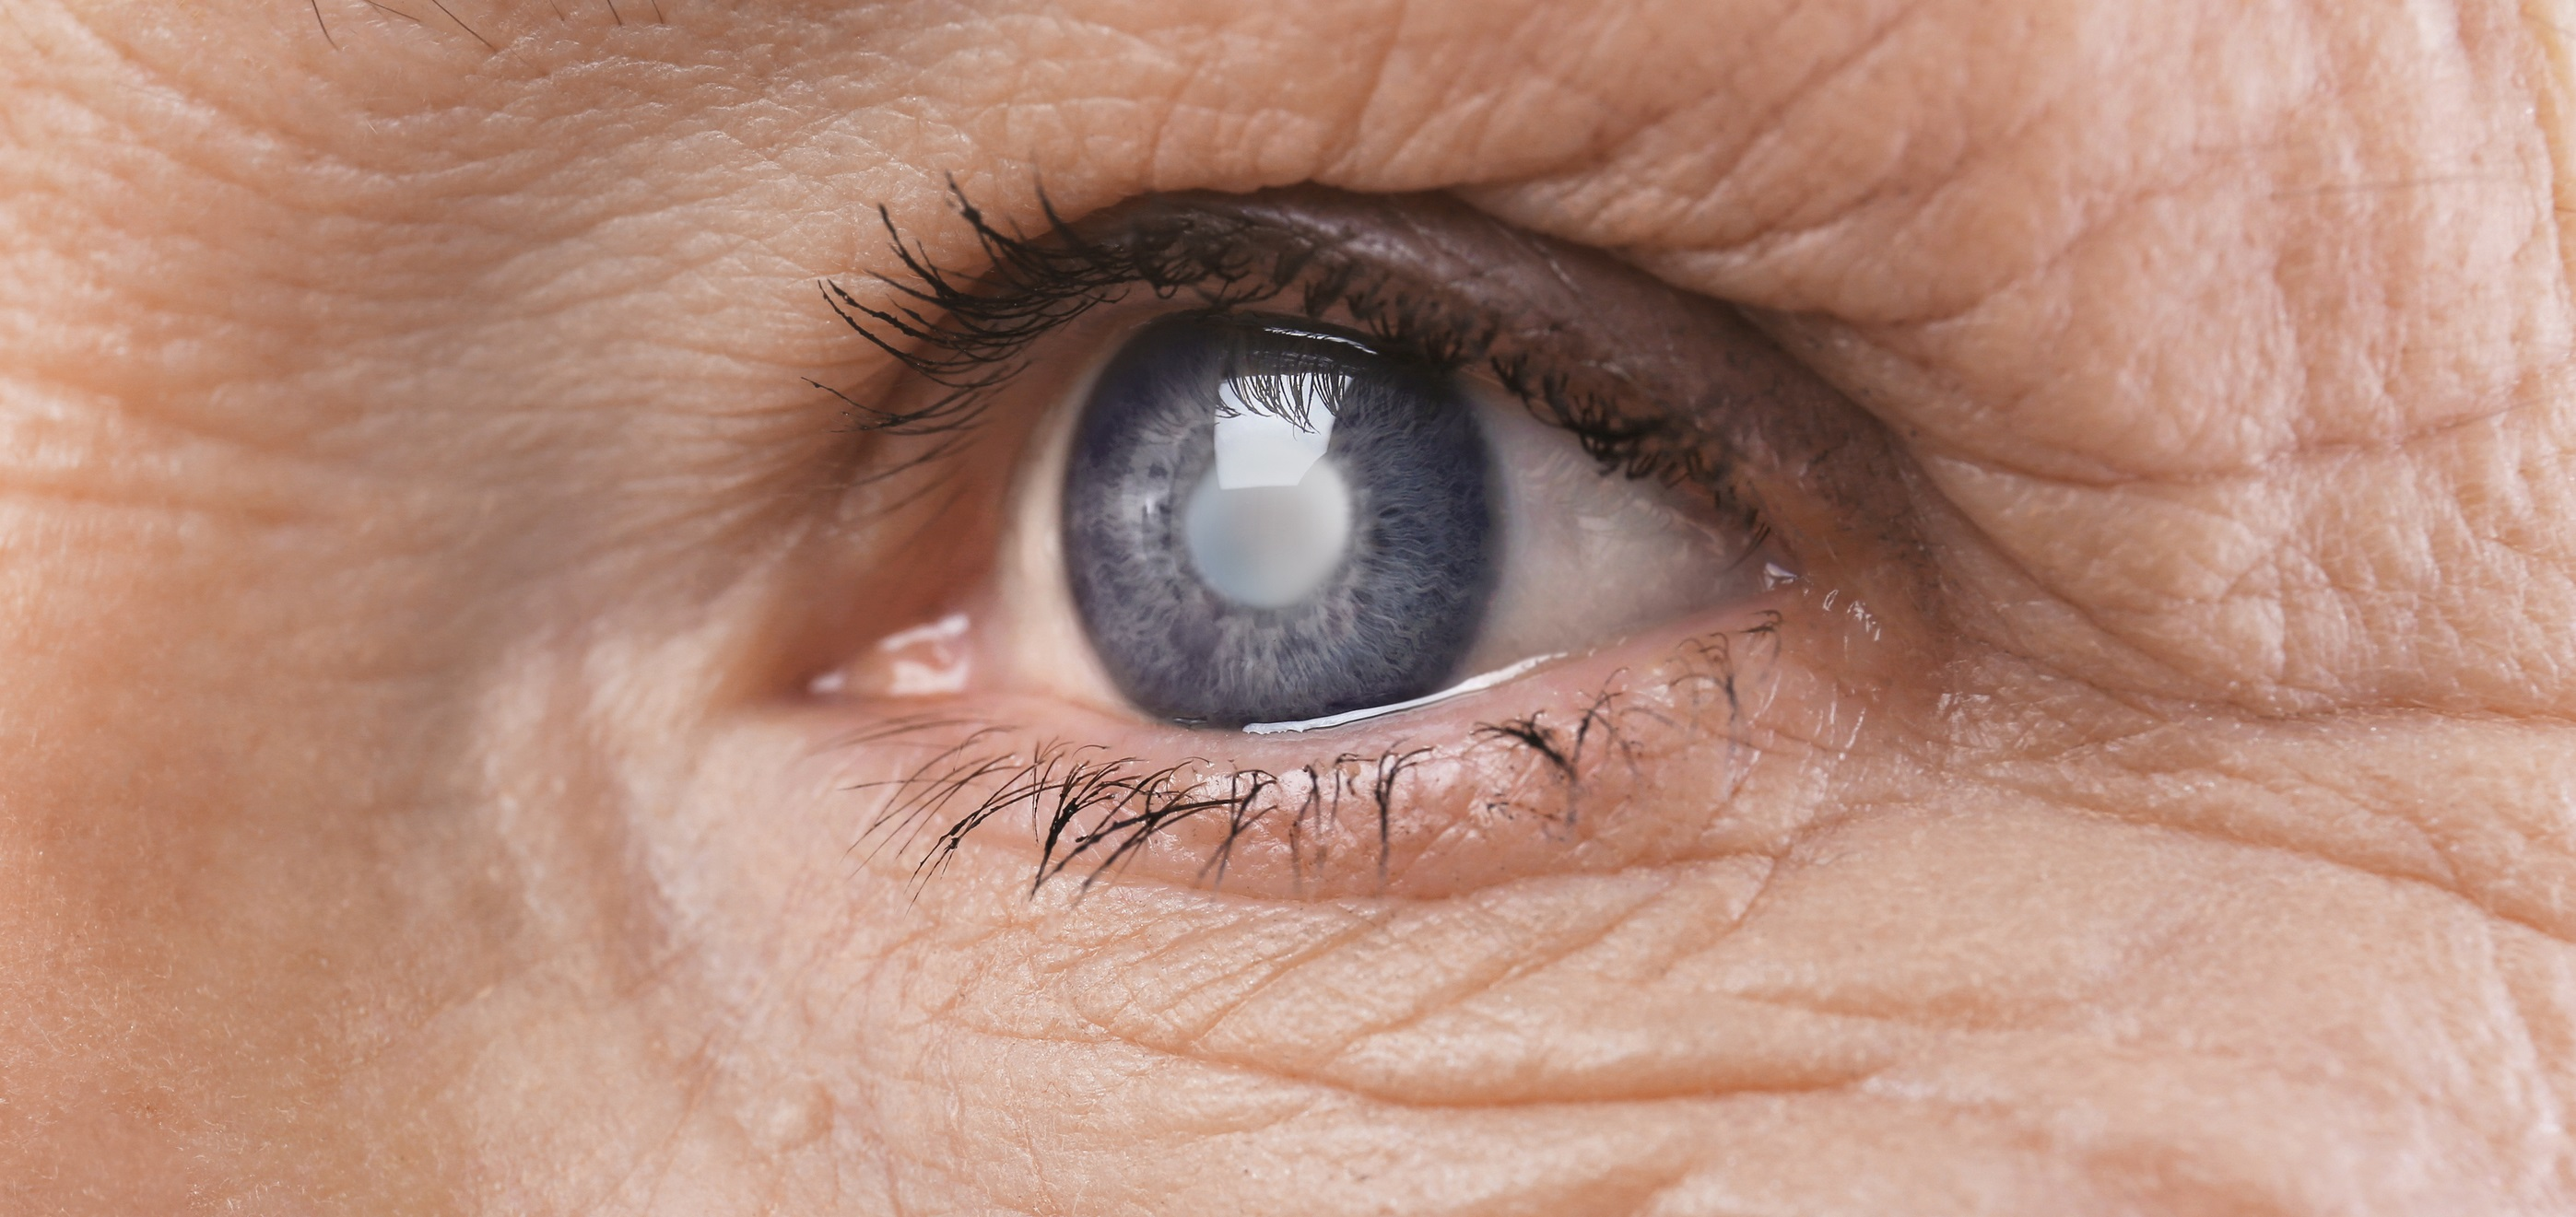 Como é feito o diagnóstico do Glaucoma?